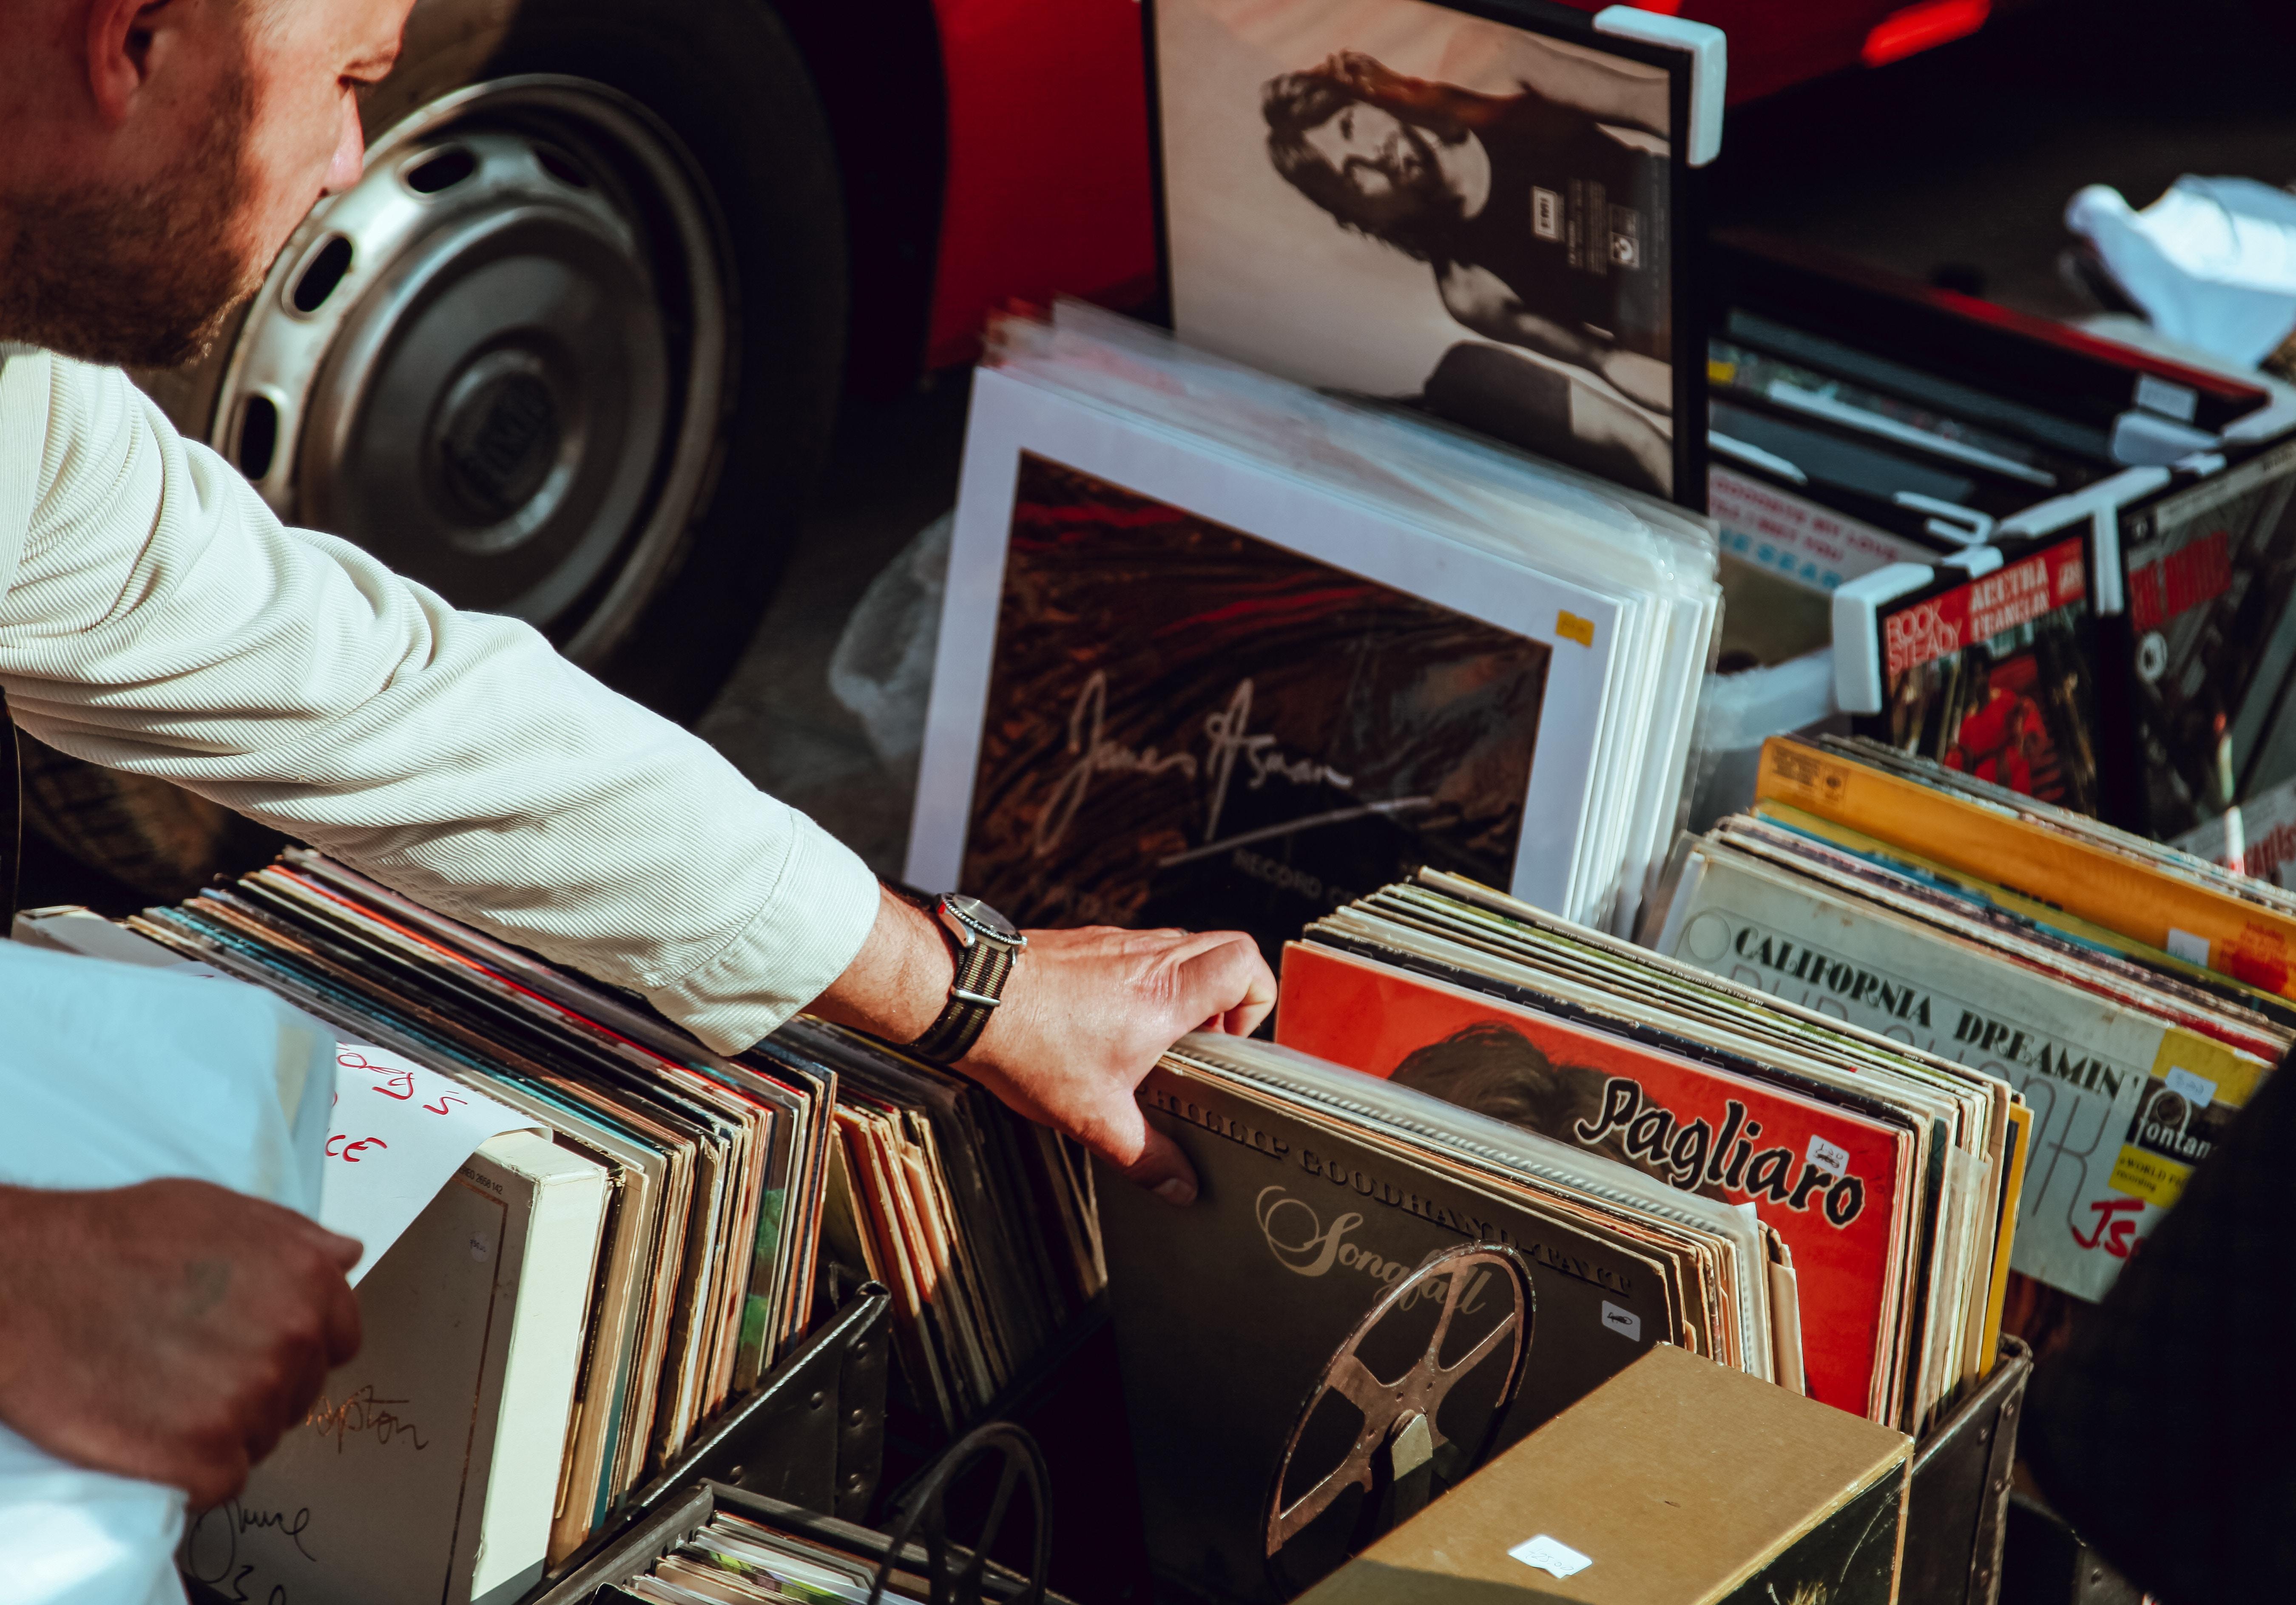 man digging through crate of vinyl